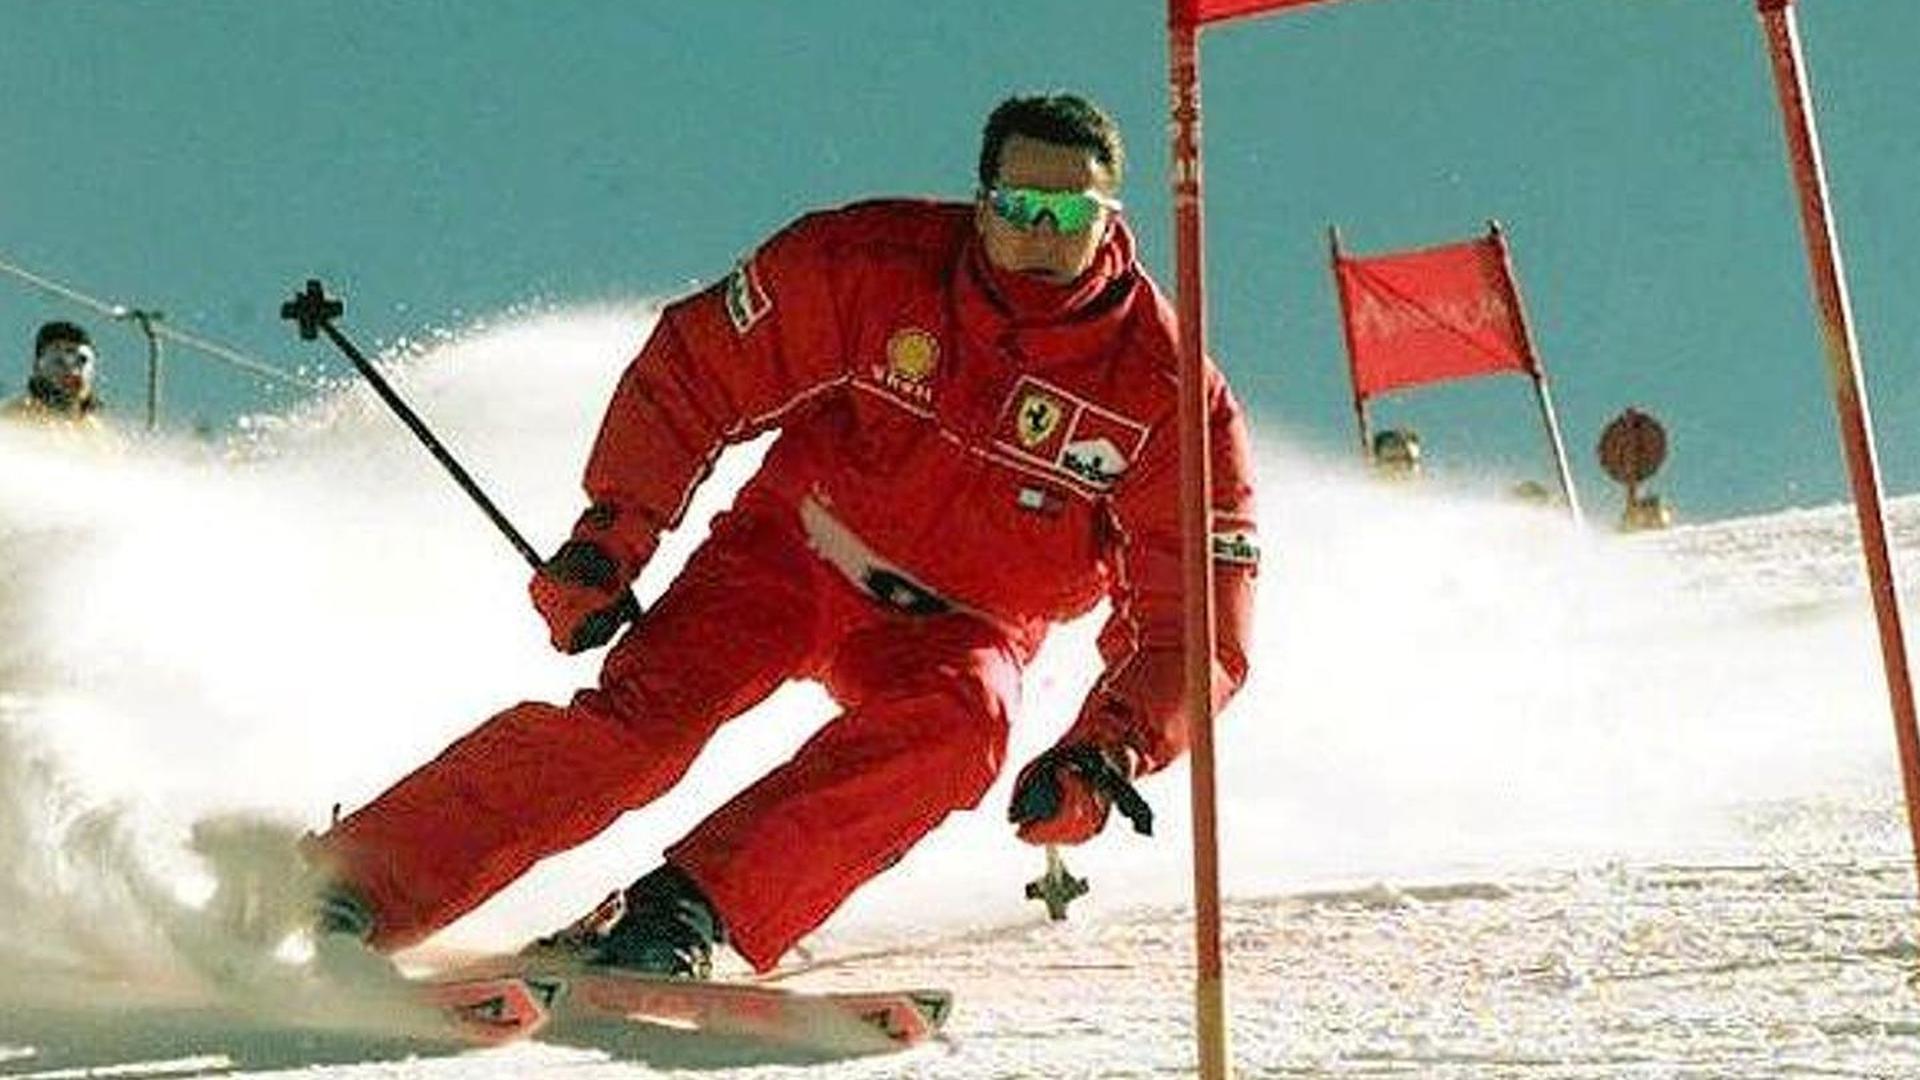 Schumacher ski story is 'tragedy' - Ecclestone